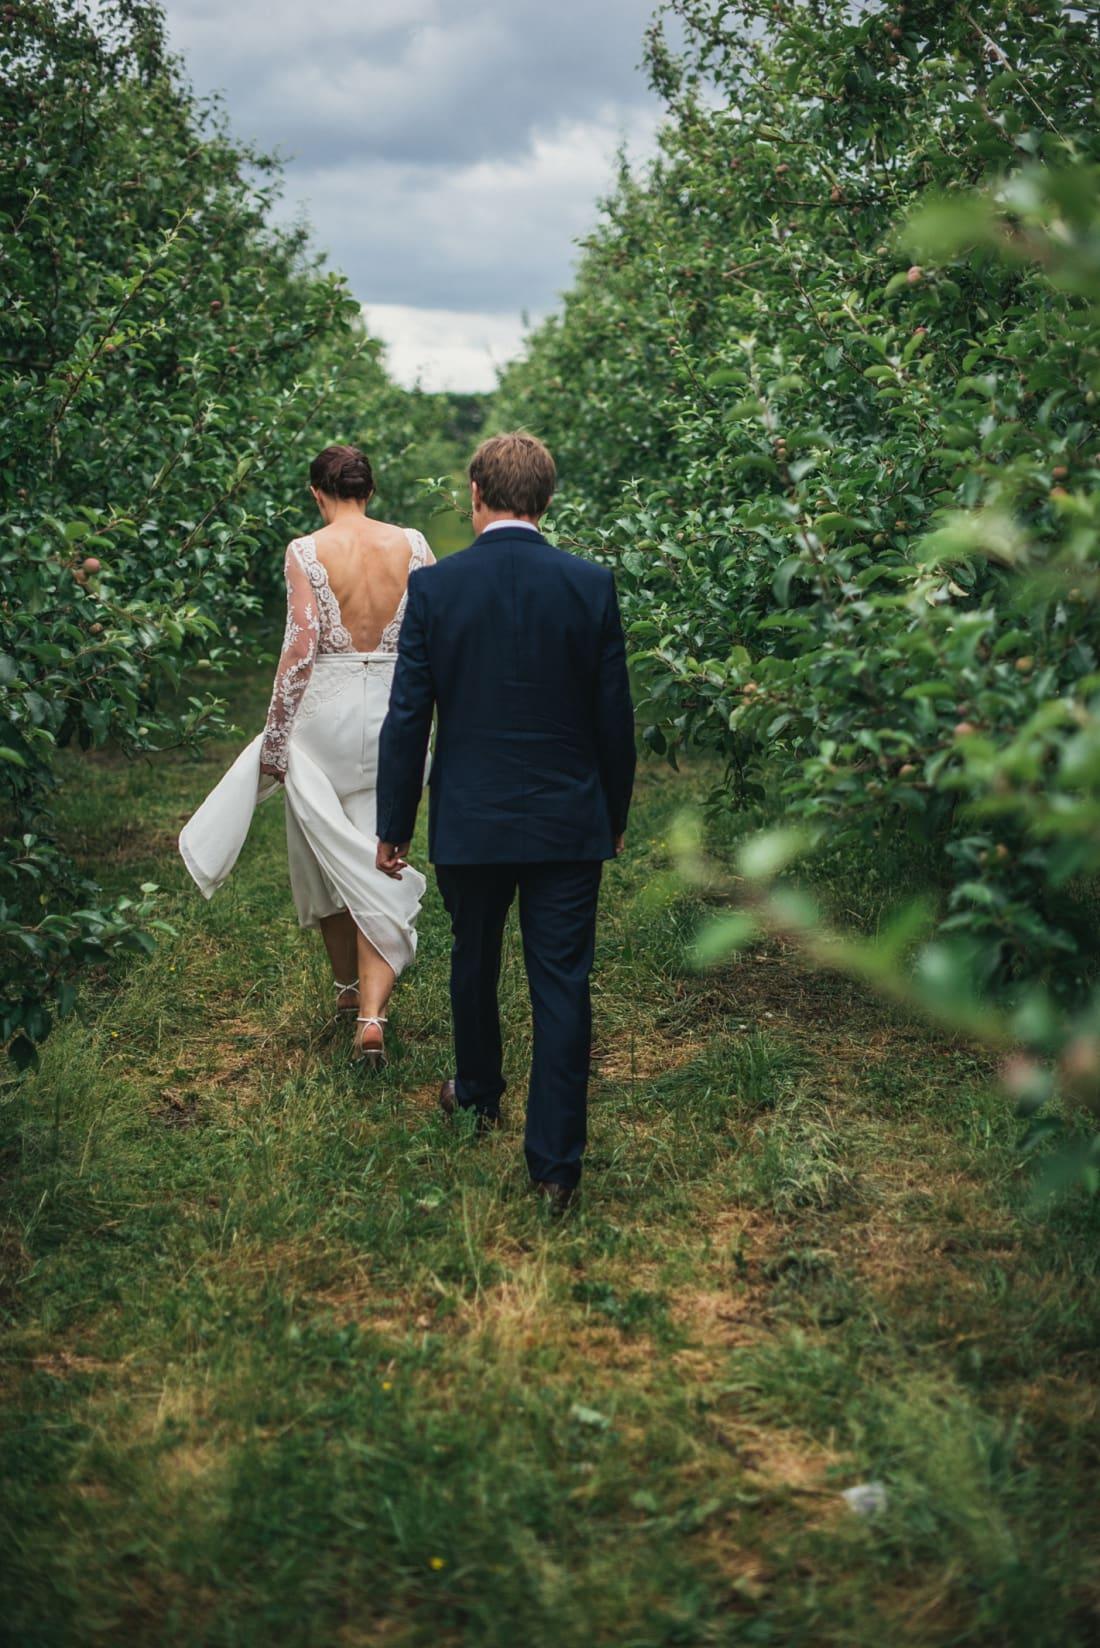 Nicola & Ben, Ngatarawa Wedding, Hawke's Bay